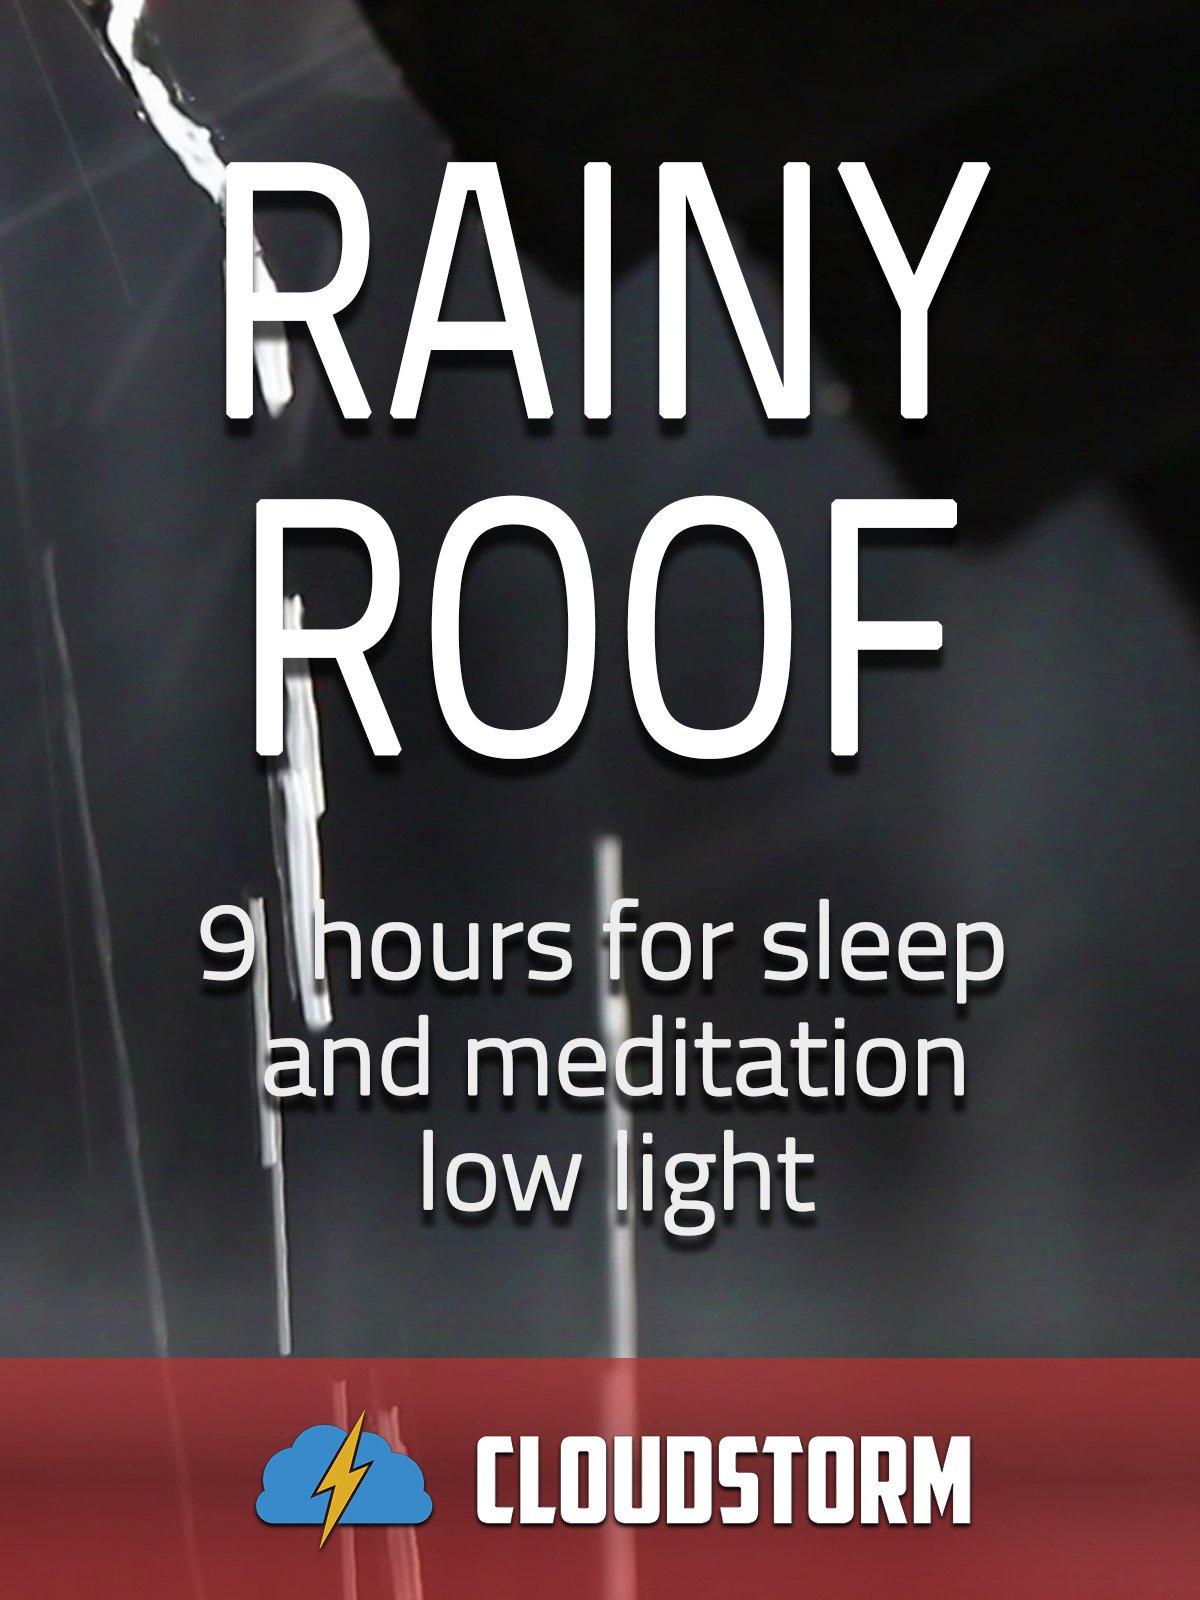 Rainy roof, 9 hours for Sleep and Meditation, low light